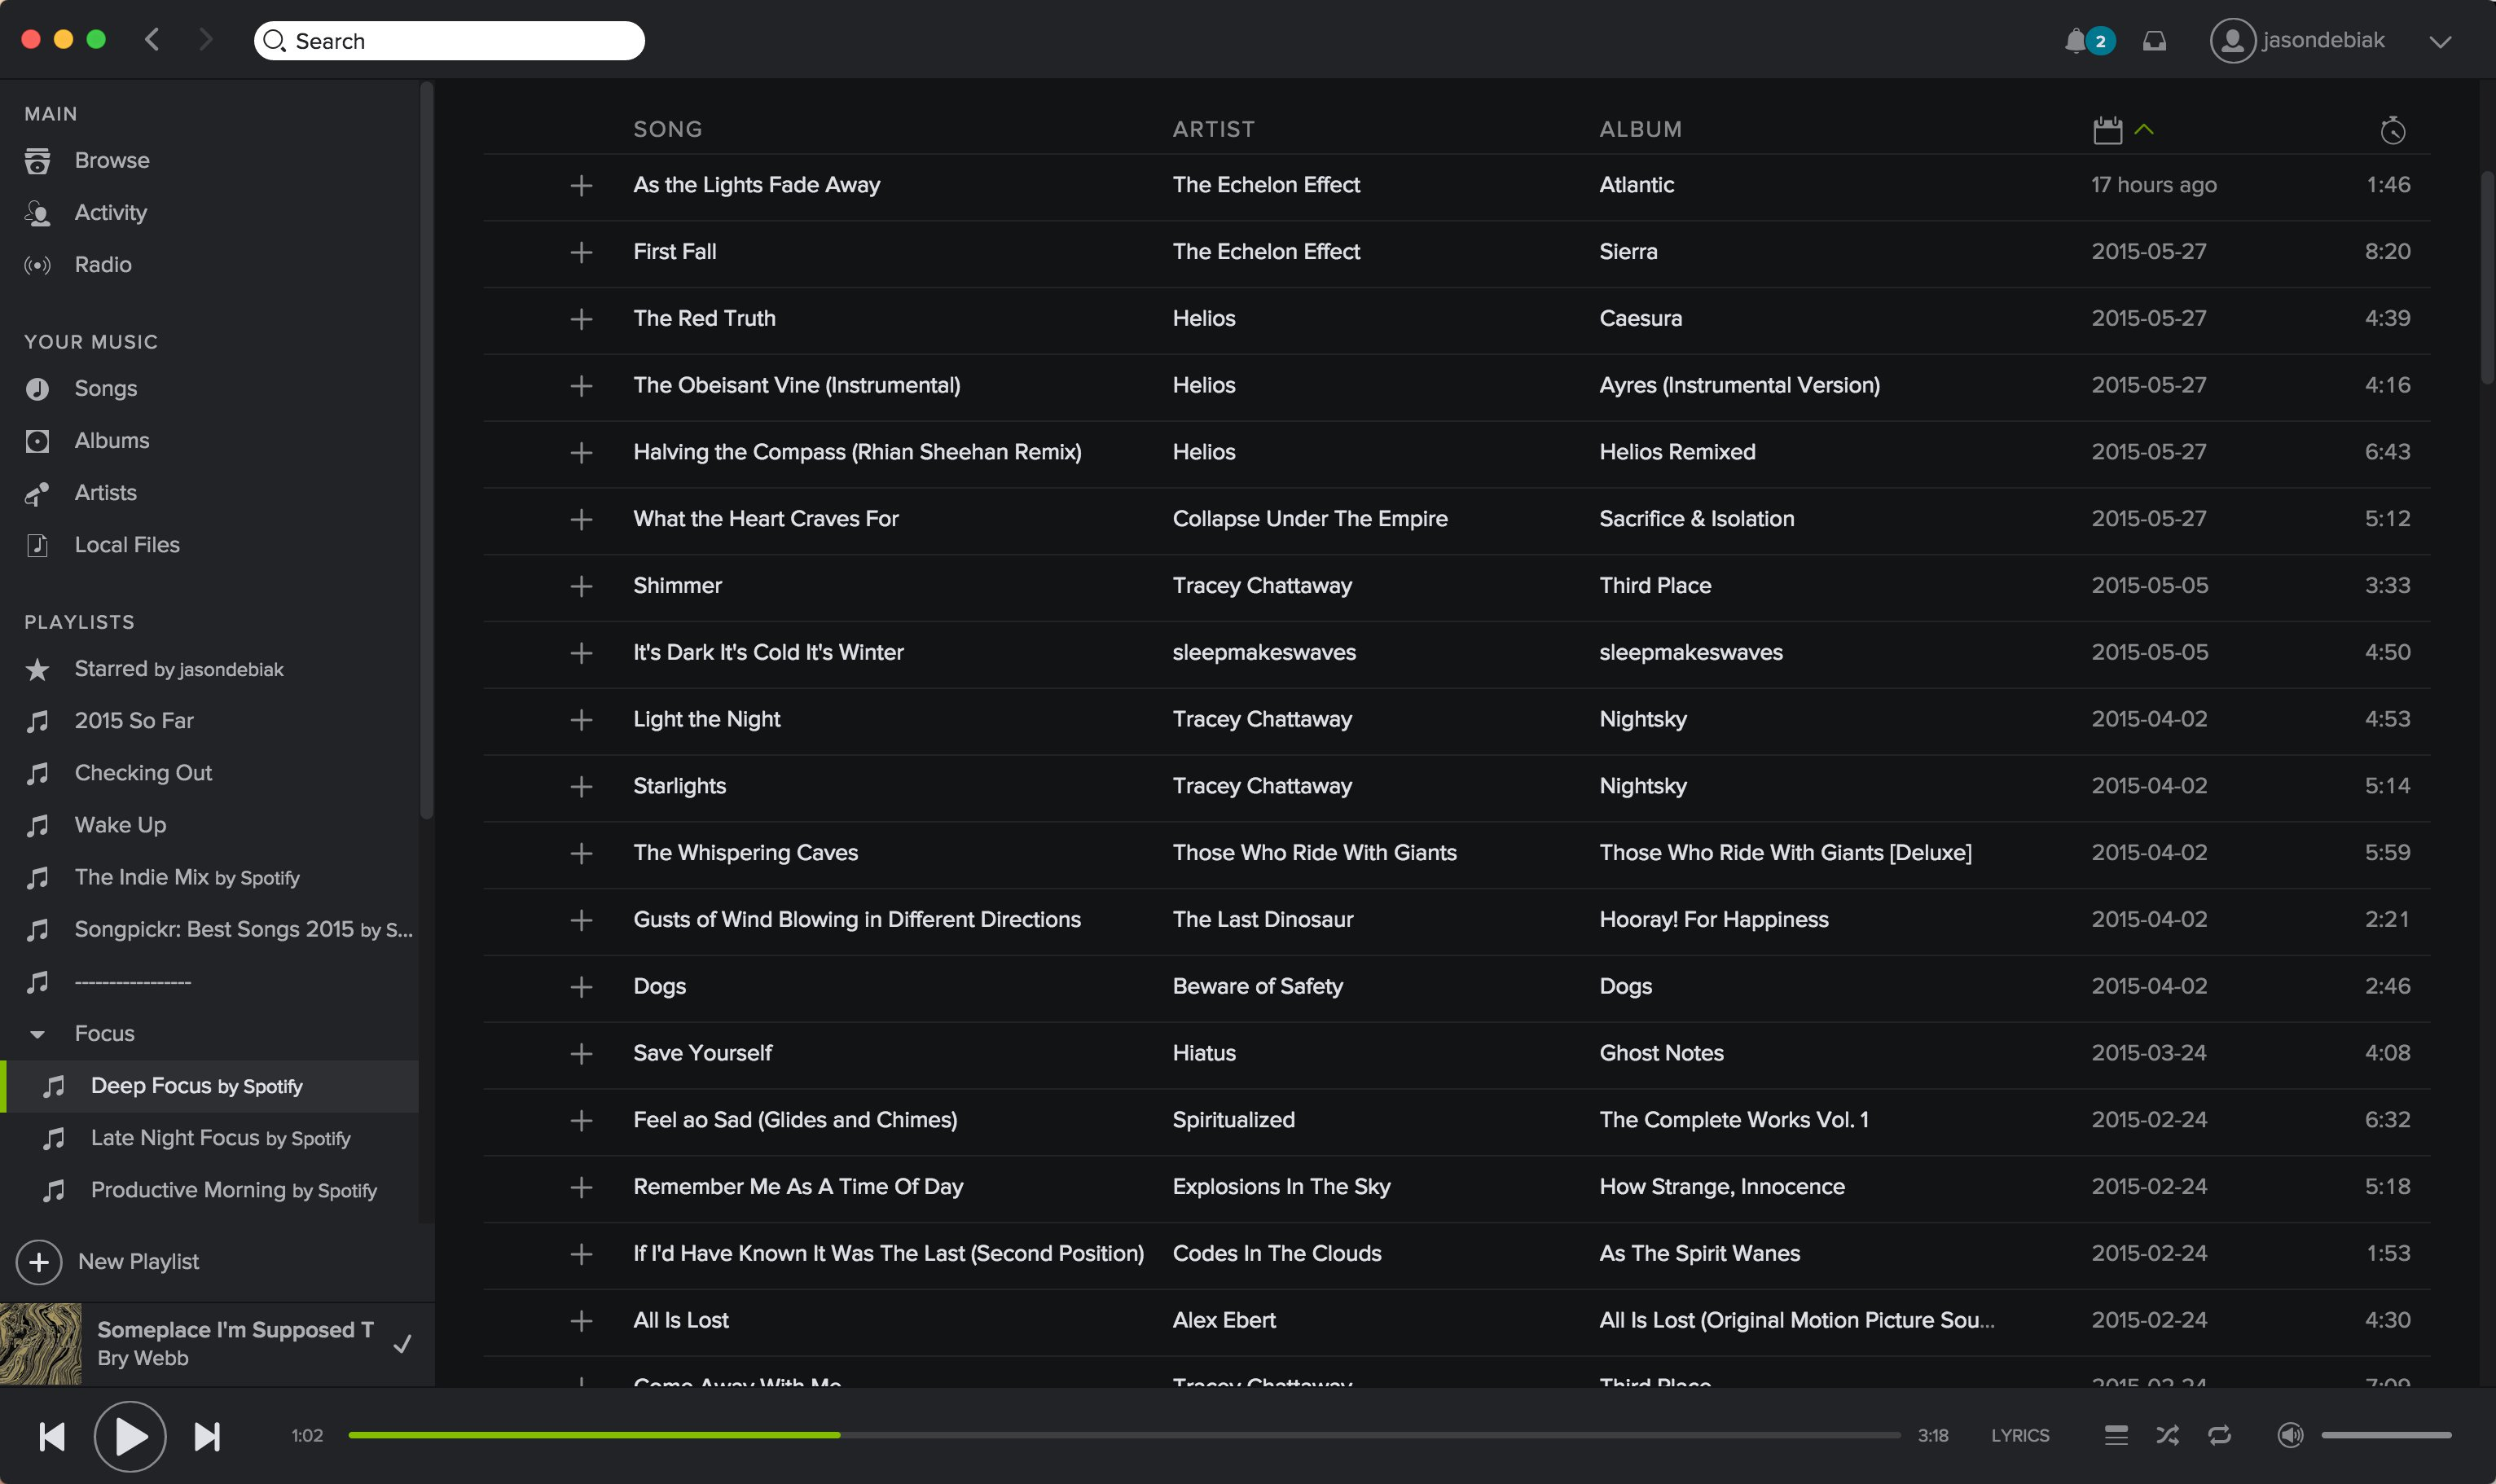 spotify-playlist-original.jpg